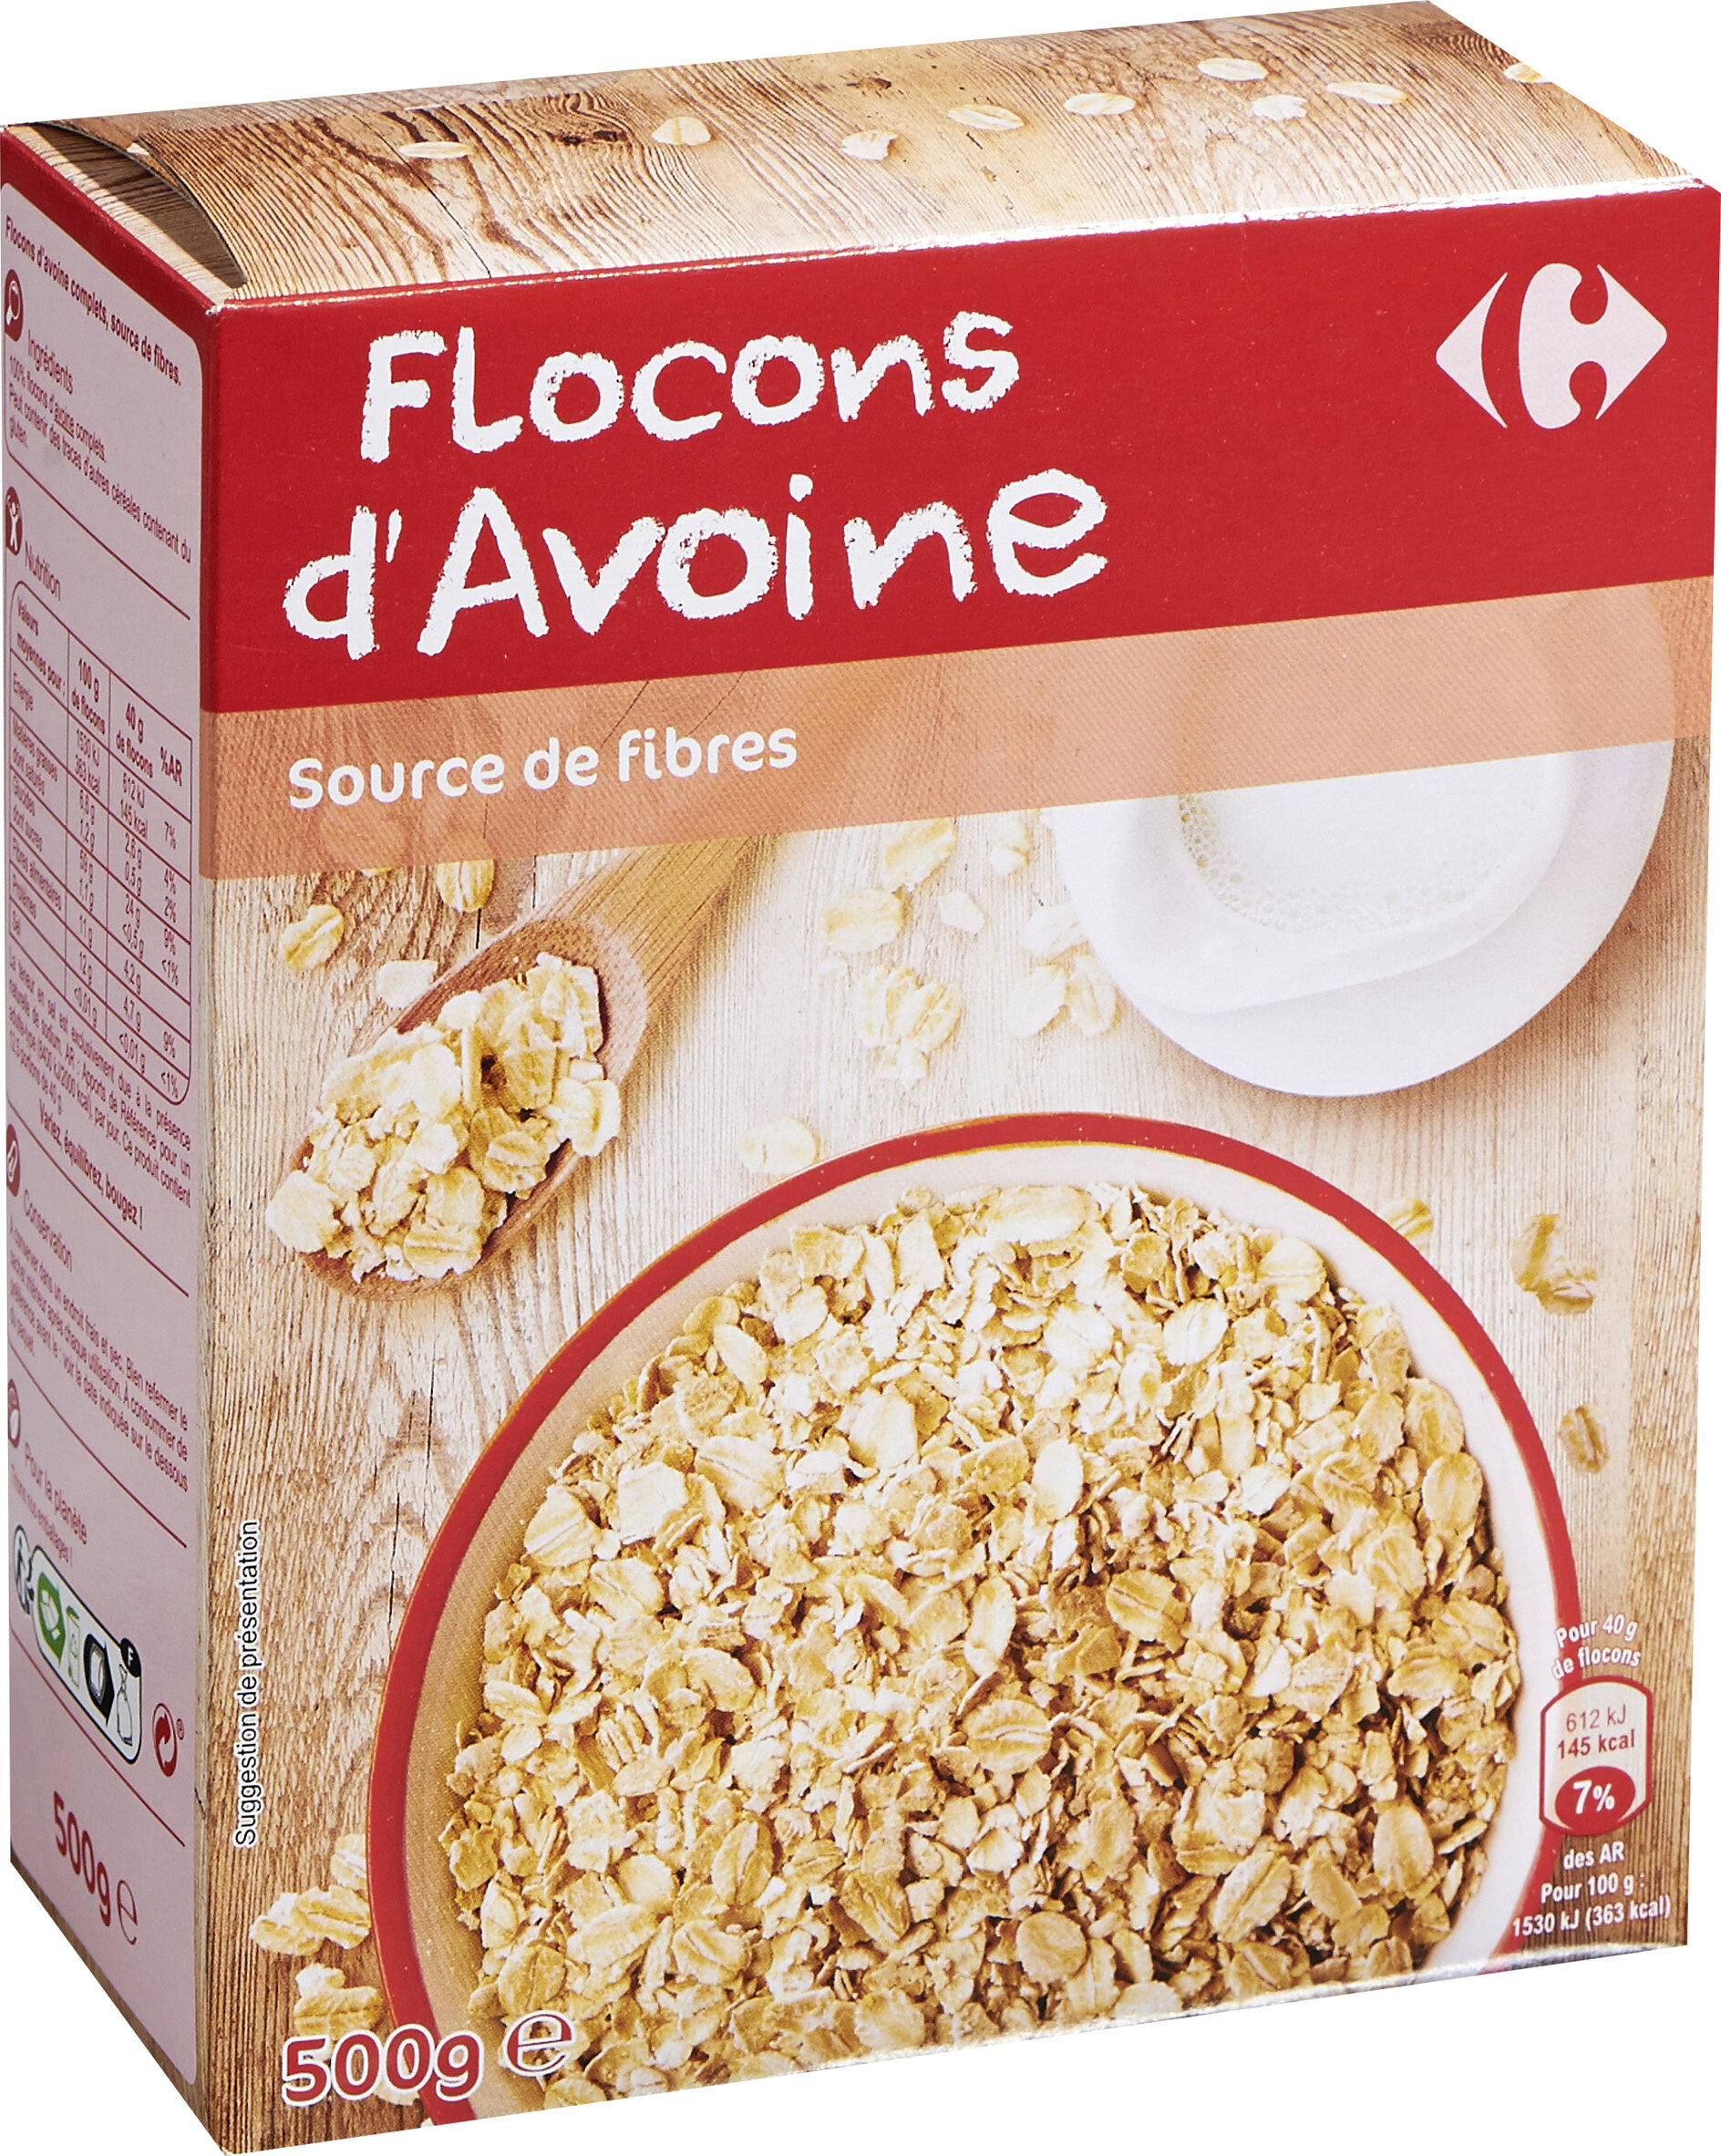 Flocon d'avoine - Prodotto - fr